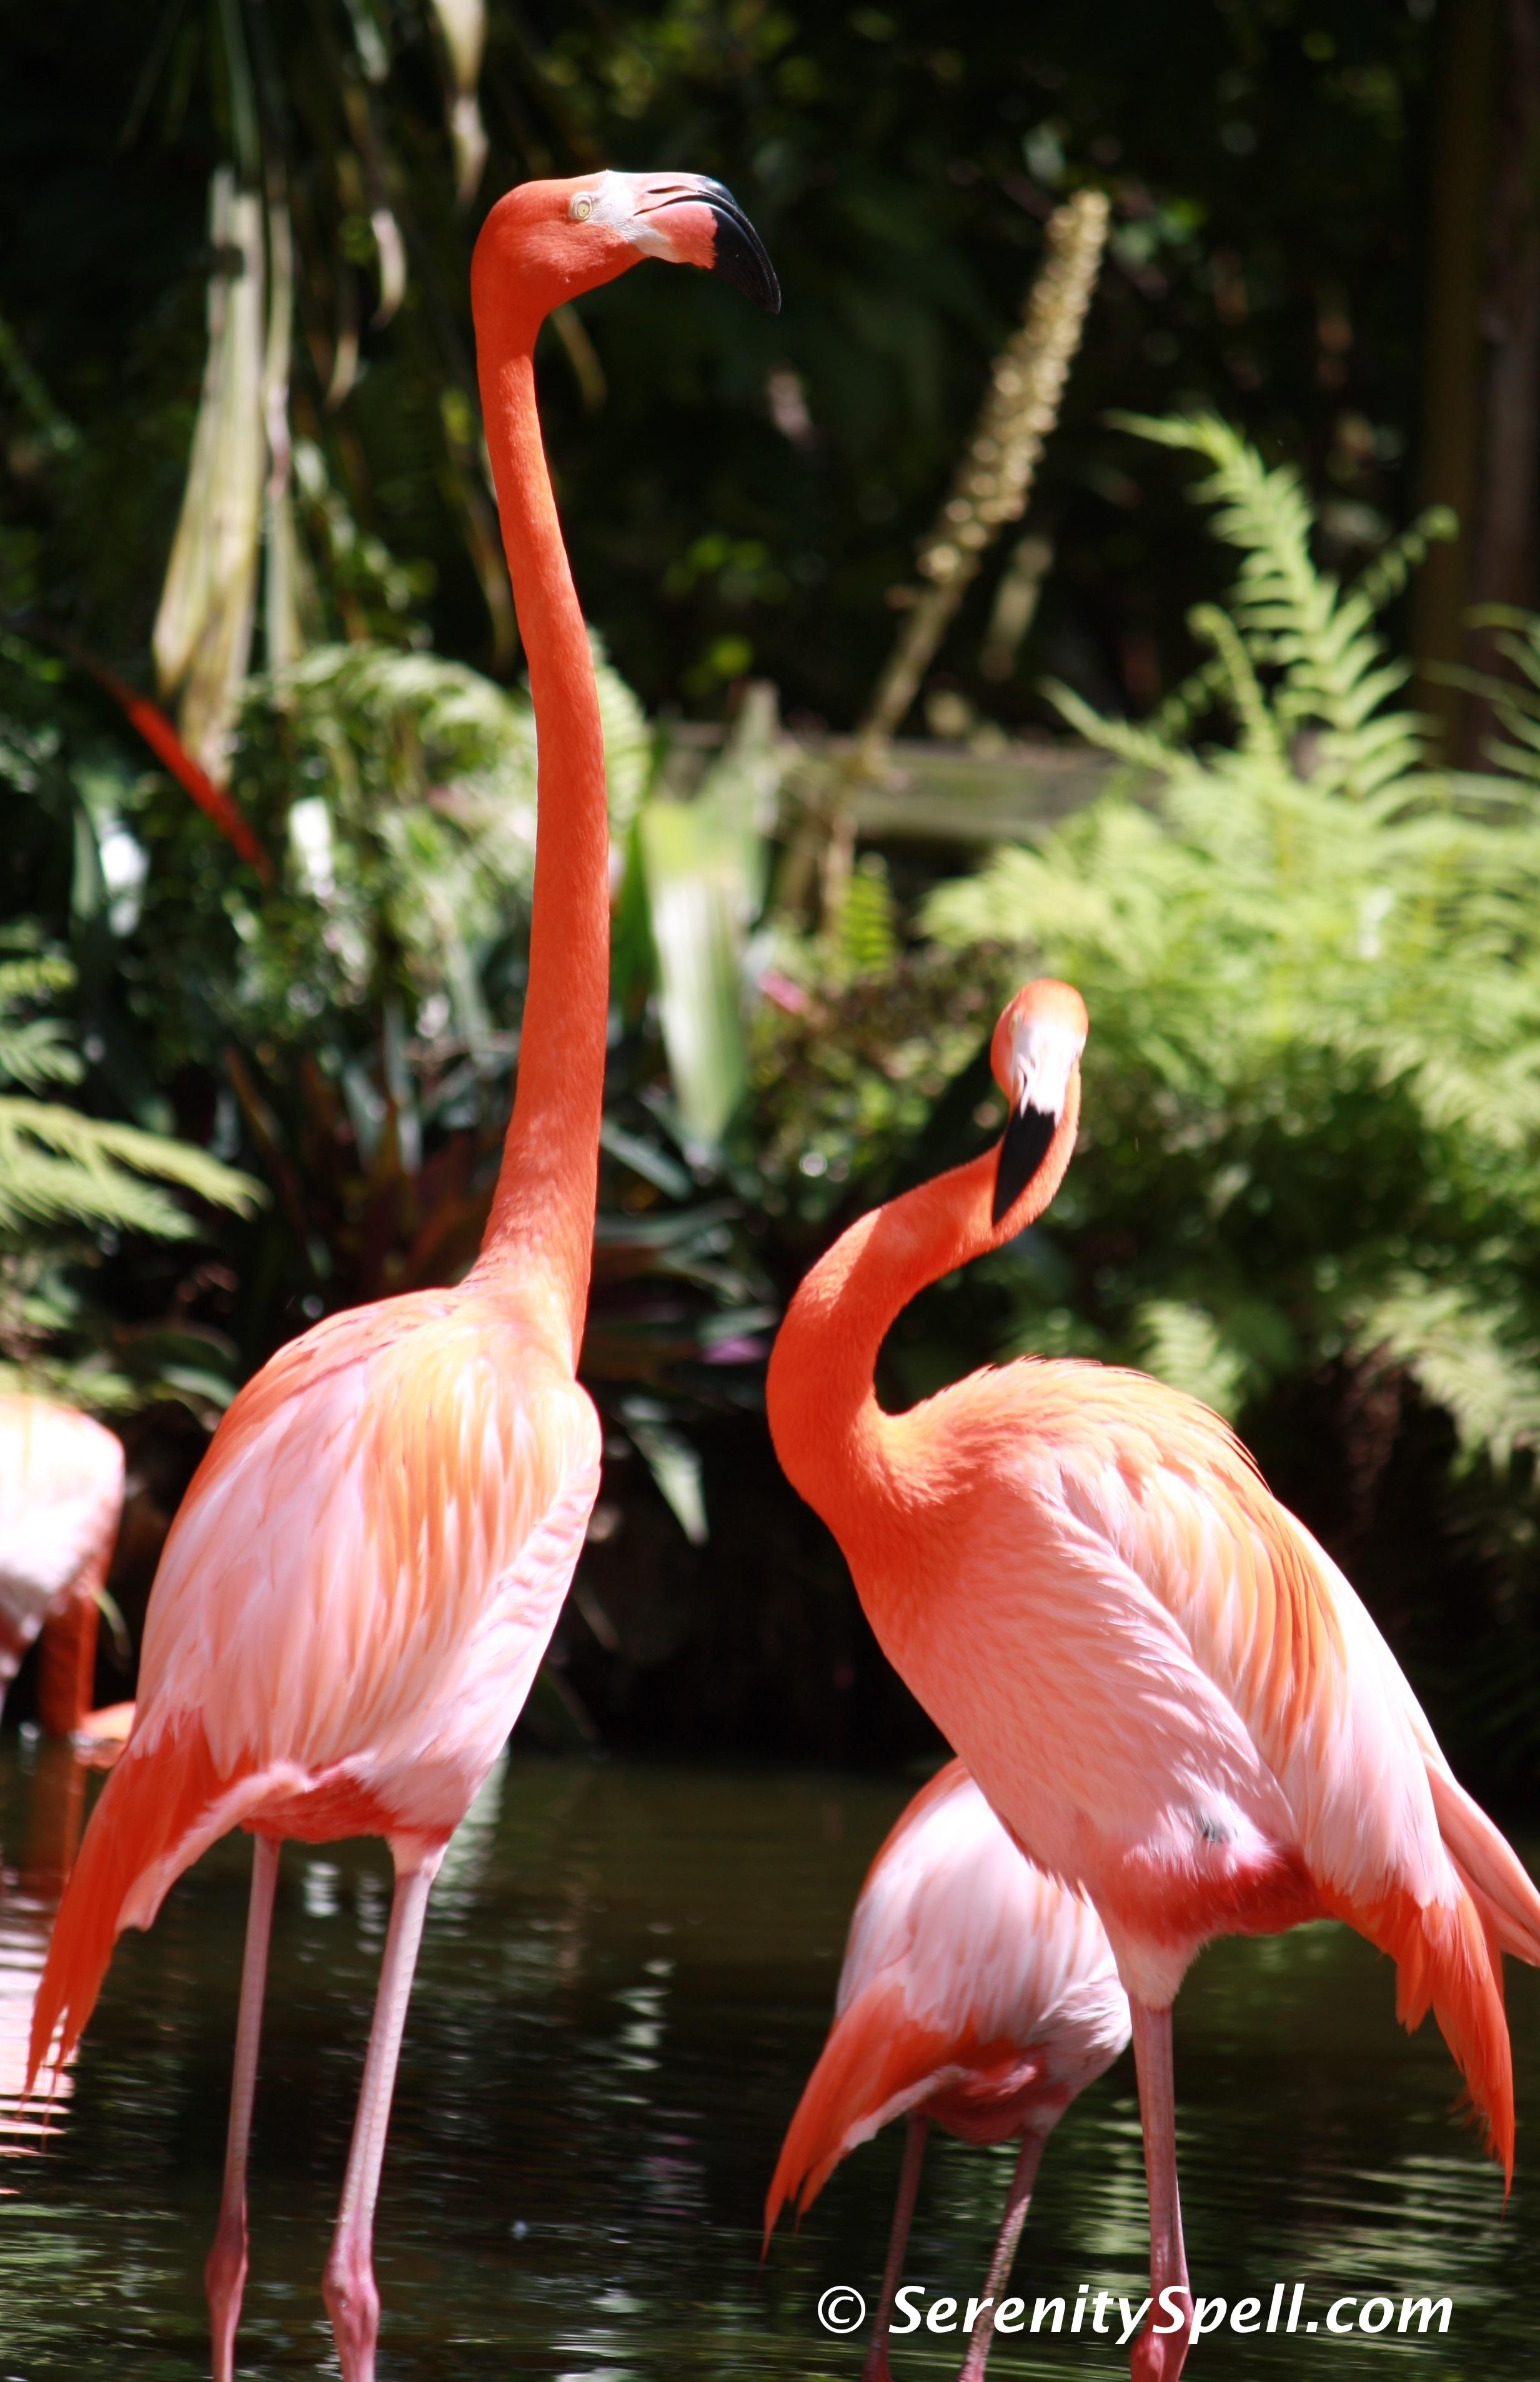 Flamingo Gardens Botanical Gardens Everglades Wildlife Sanctuary Serenity Spell